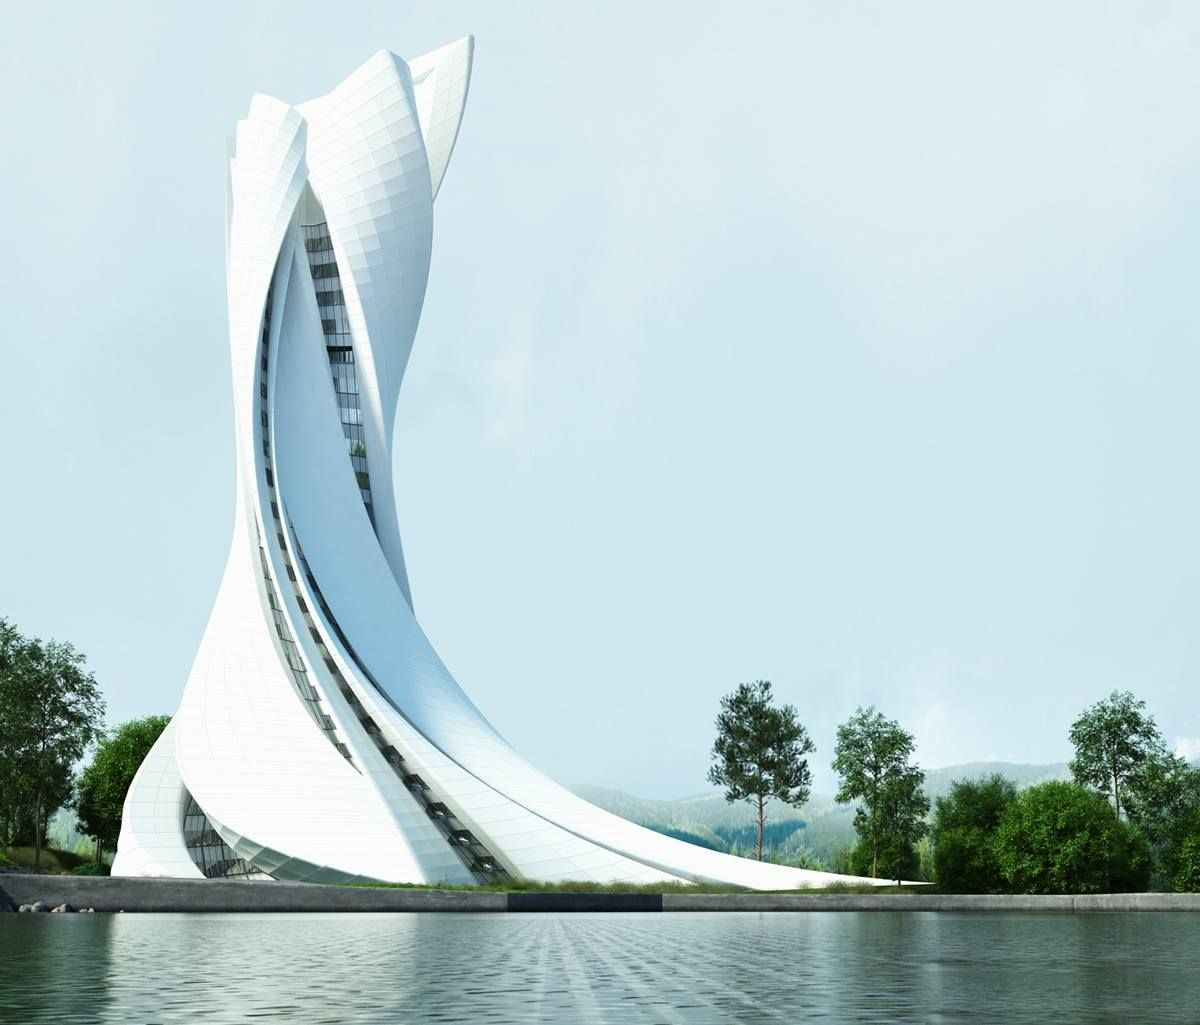 The Most Sensational Futuristic Architecture Architecture Admirers Arquitectura Increible Fachada Arquitectura Arquitectura Futurista